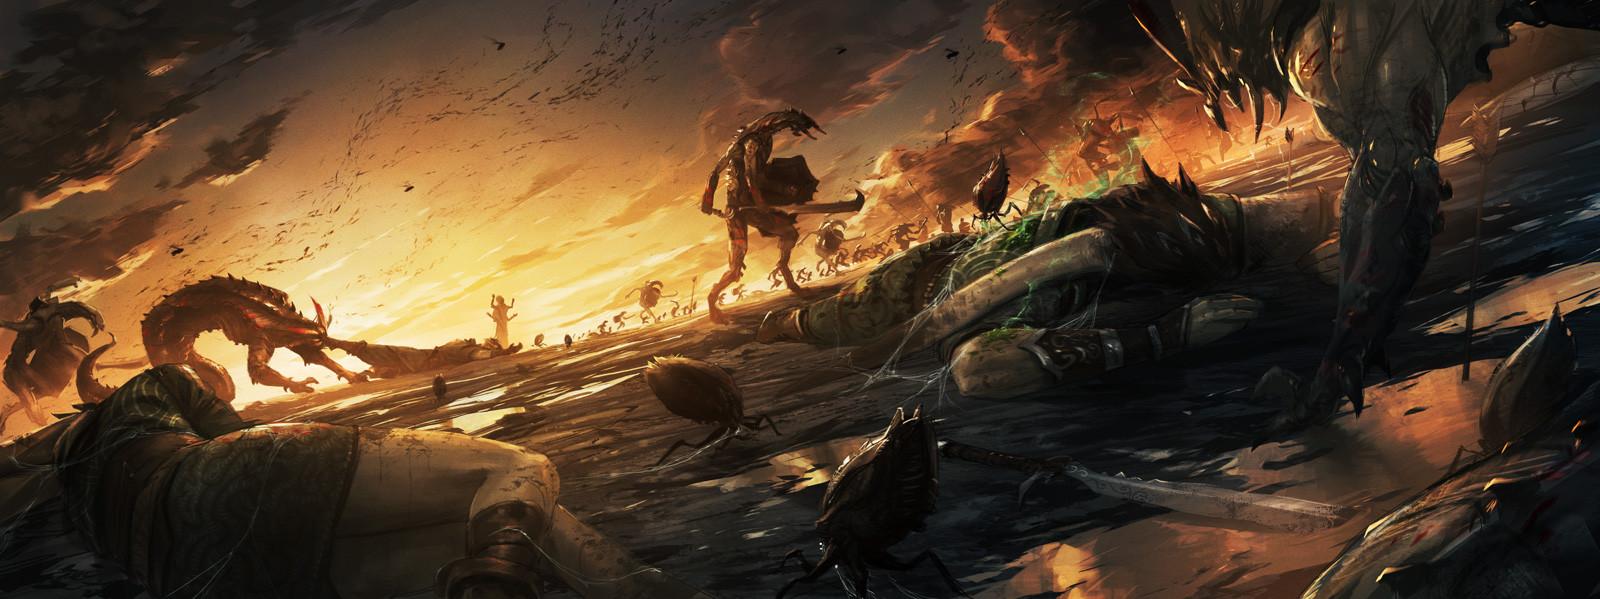 Necrophages endless legend wiki wikia - Endless legend broken lords ...